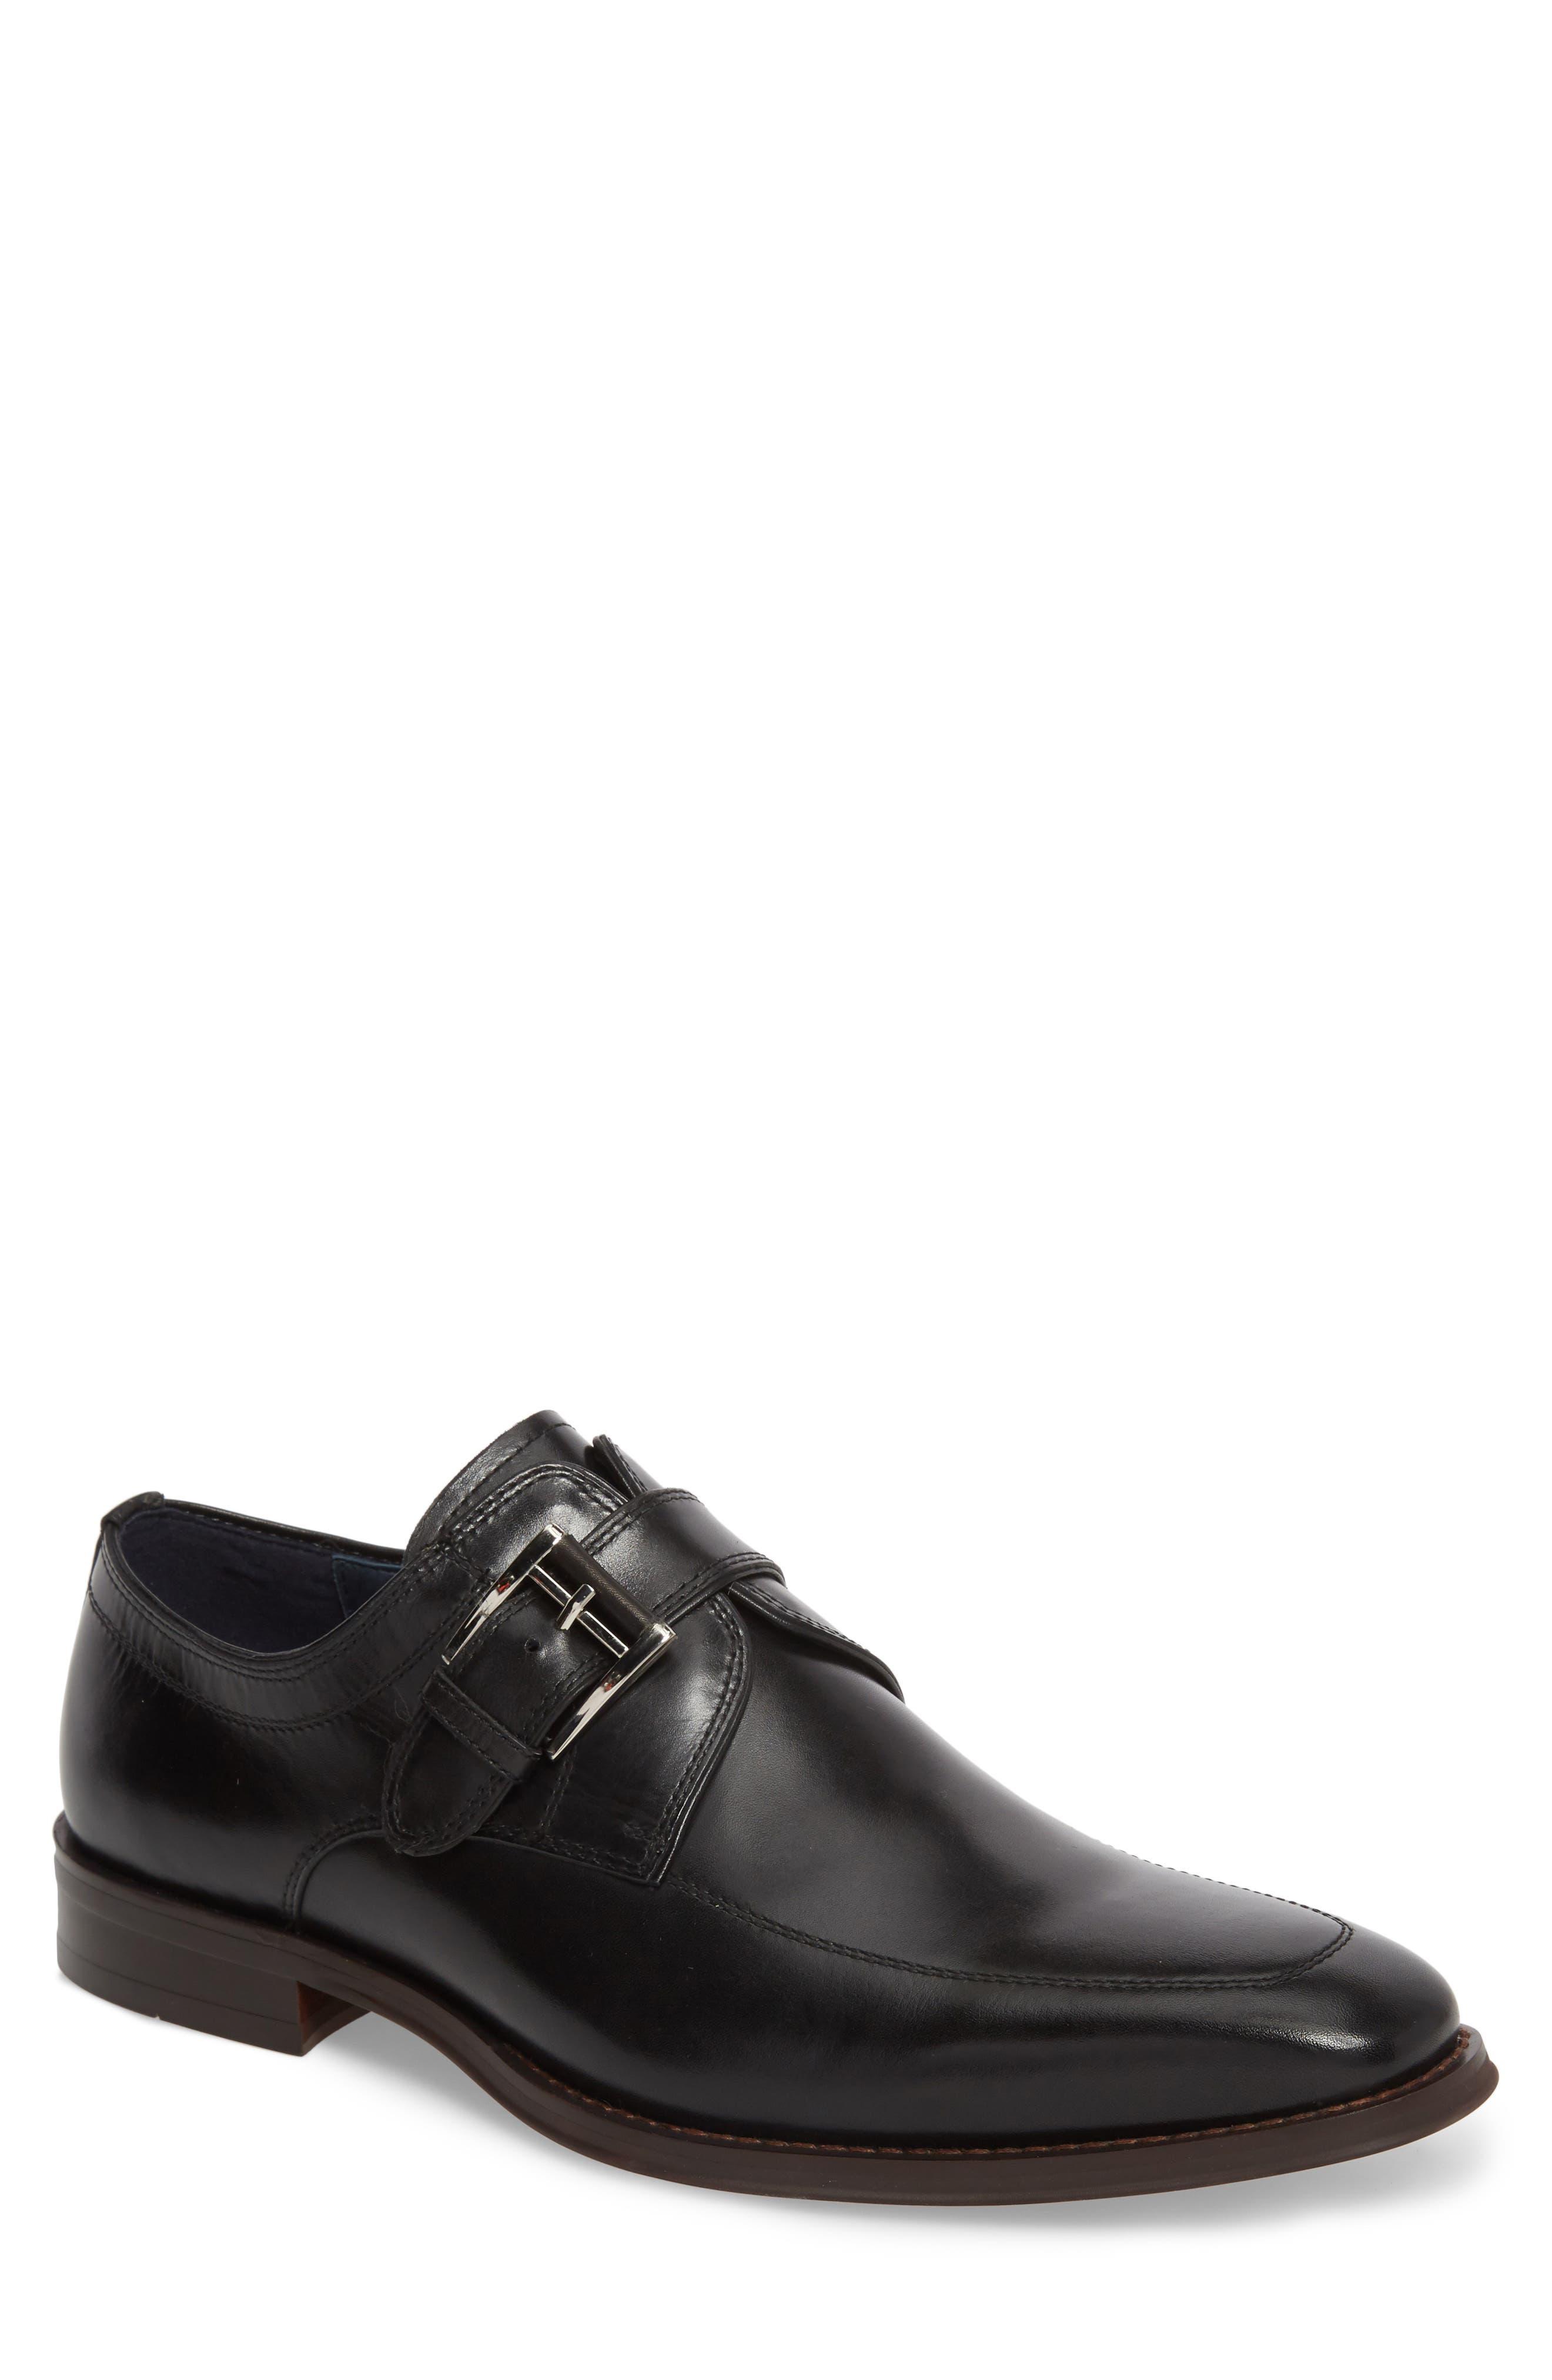 Merlot Single Buckle Monk Shoe,                             Main thumbnail 1, color,                             BLACK LEATHER